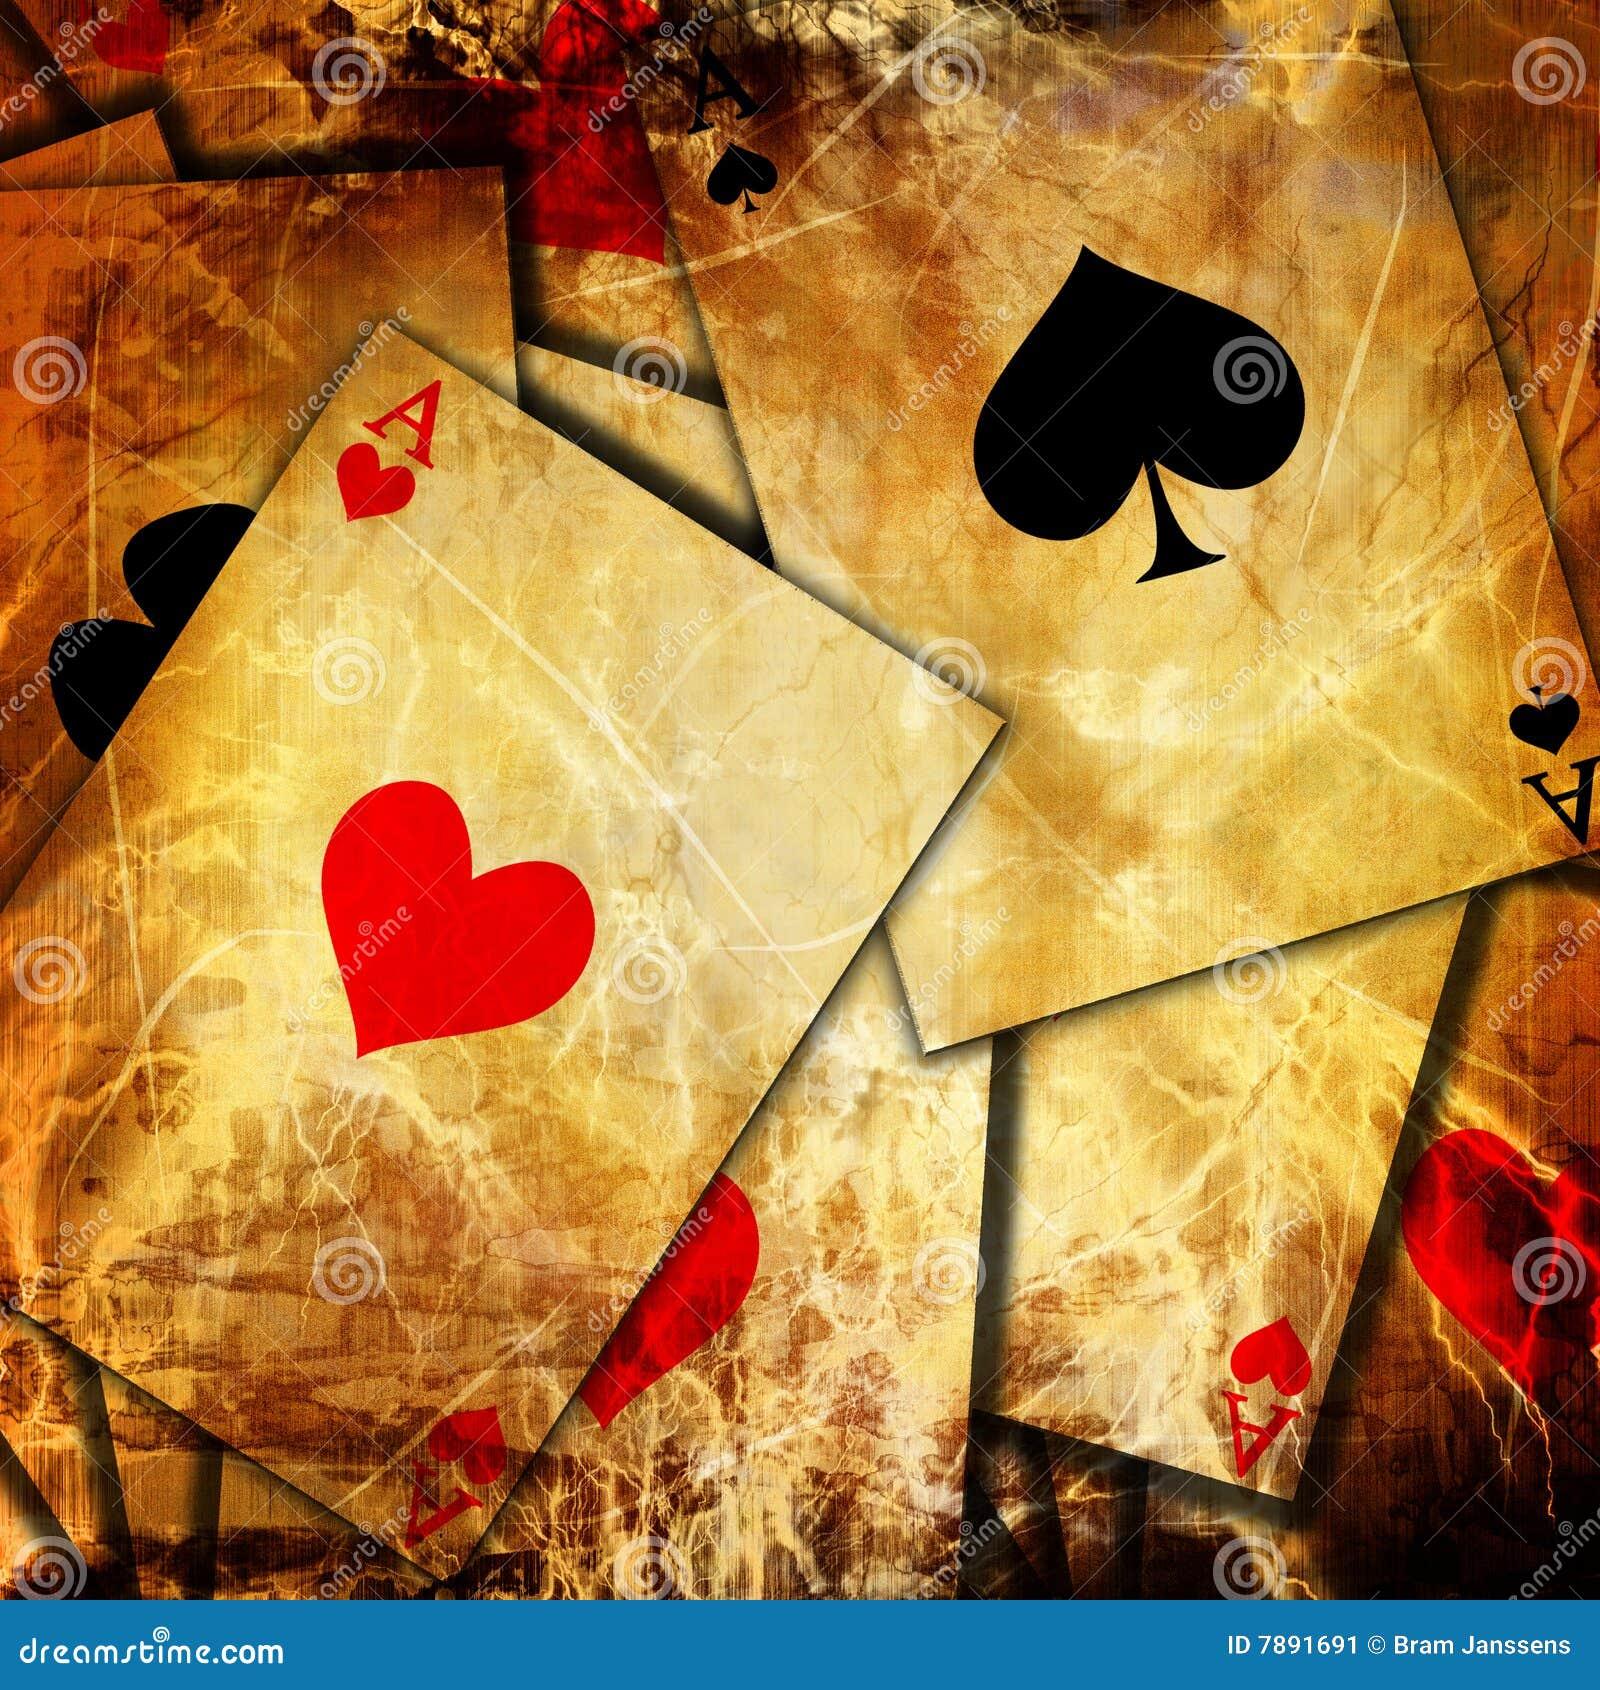 playing cards background stock image  image 7891691